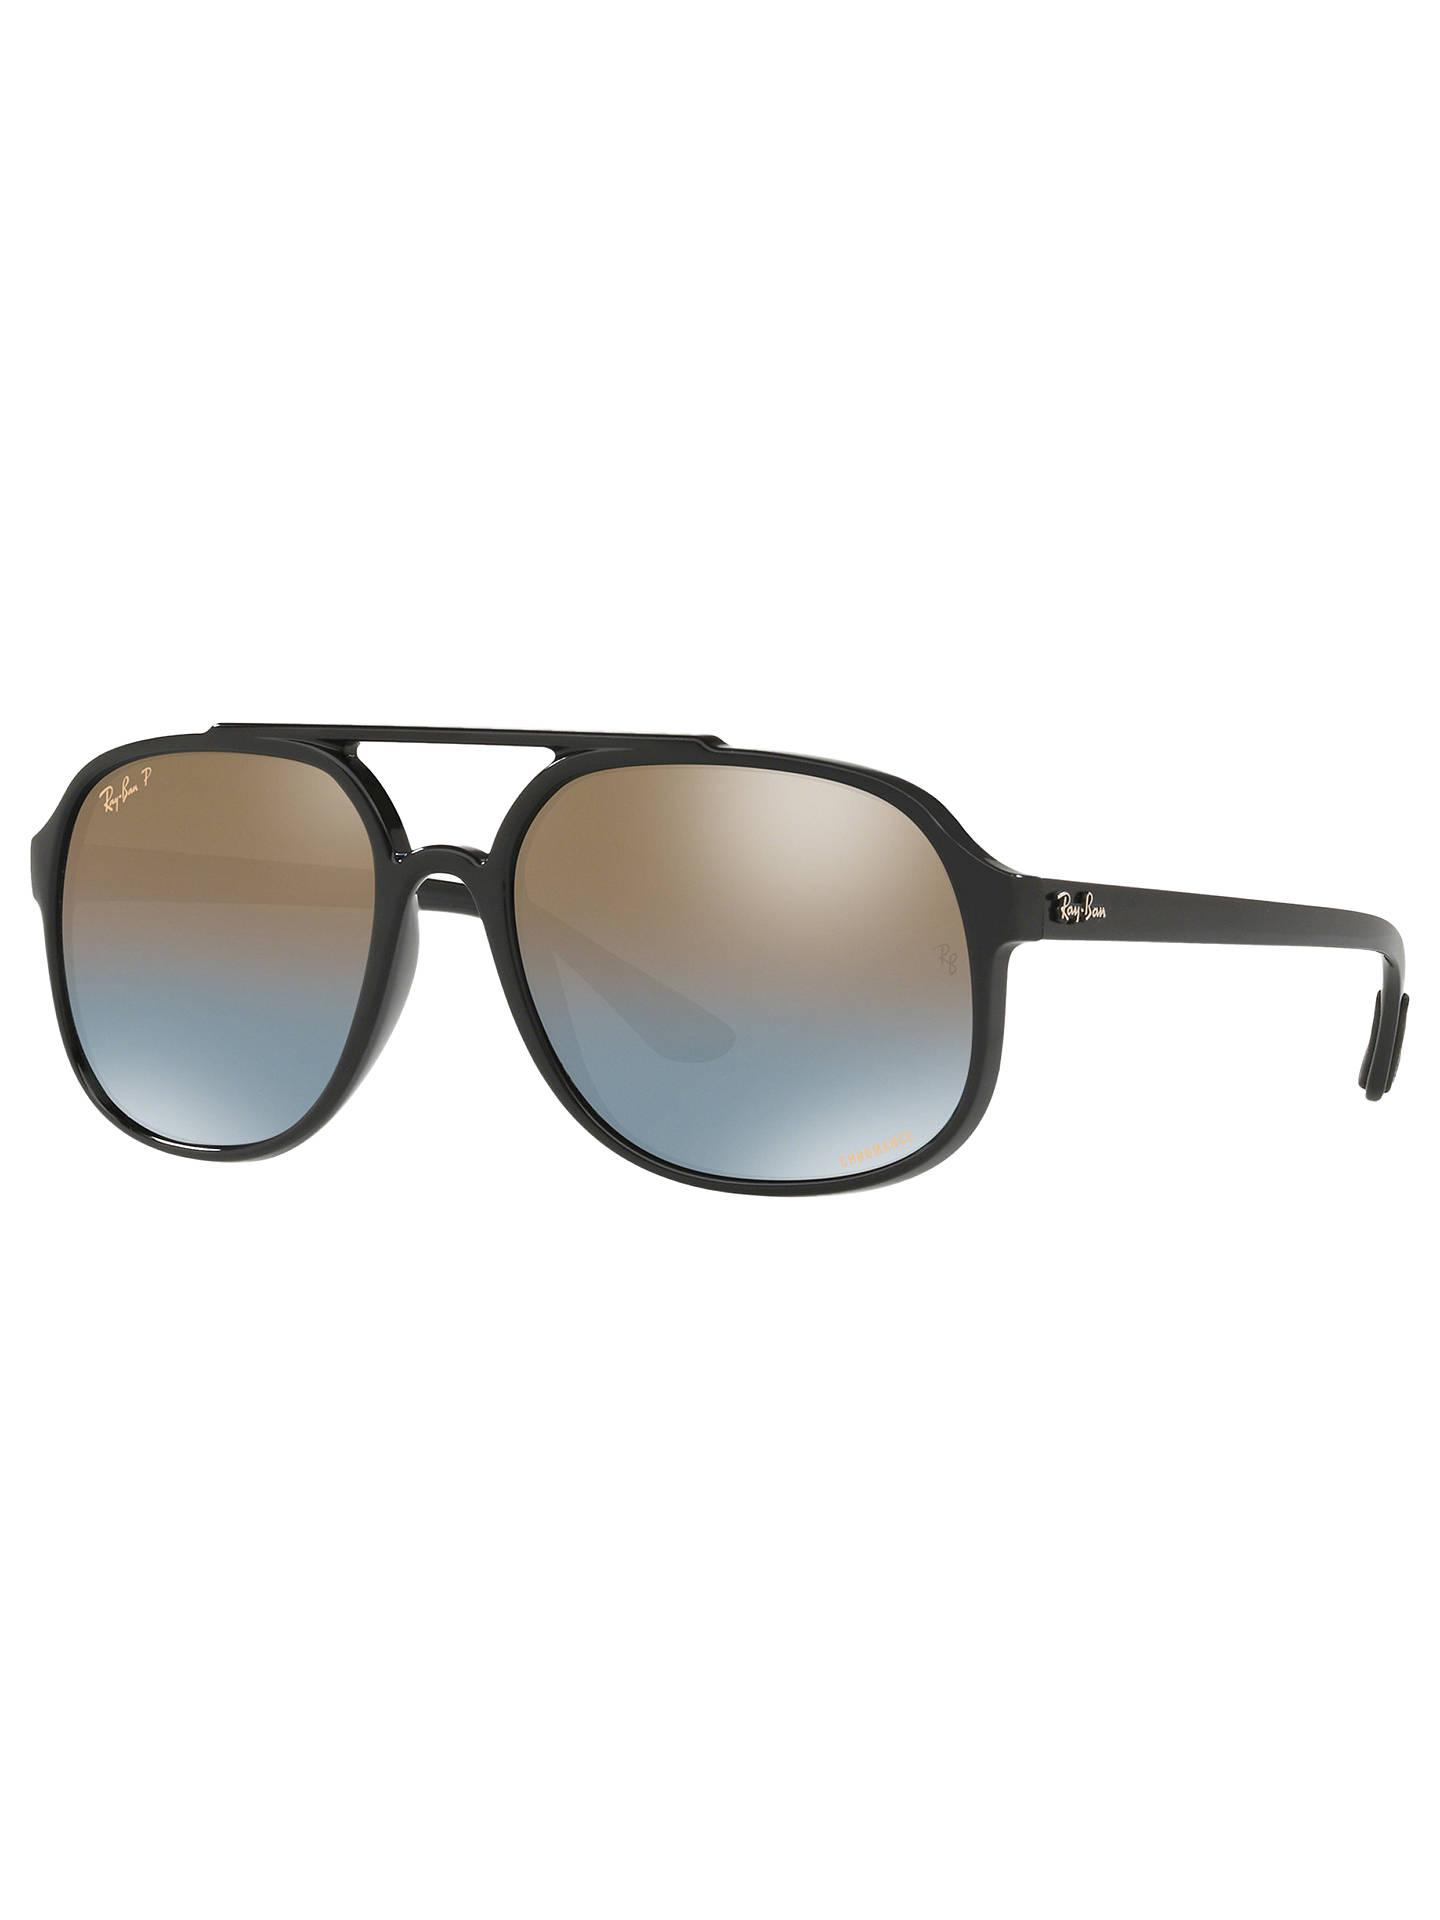 76b9221089b BuyRay-Ban RB4312 Men s Square Sunglasses